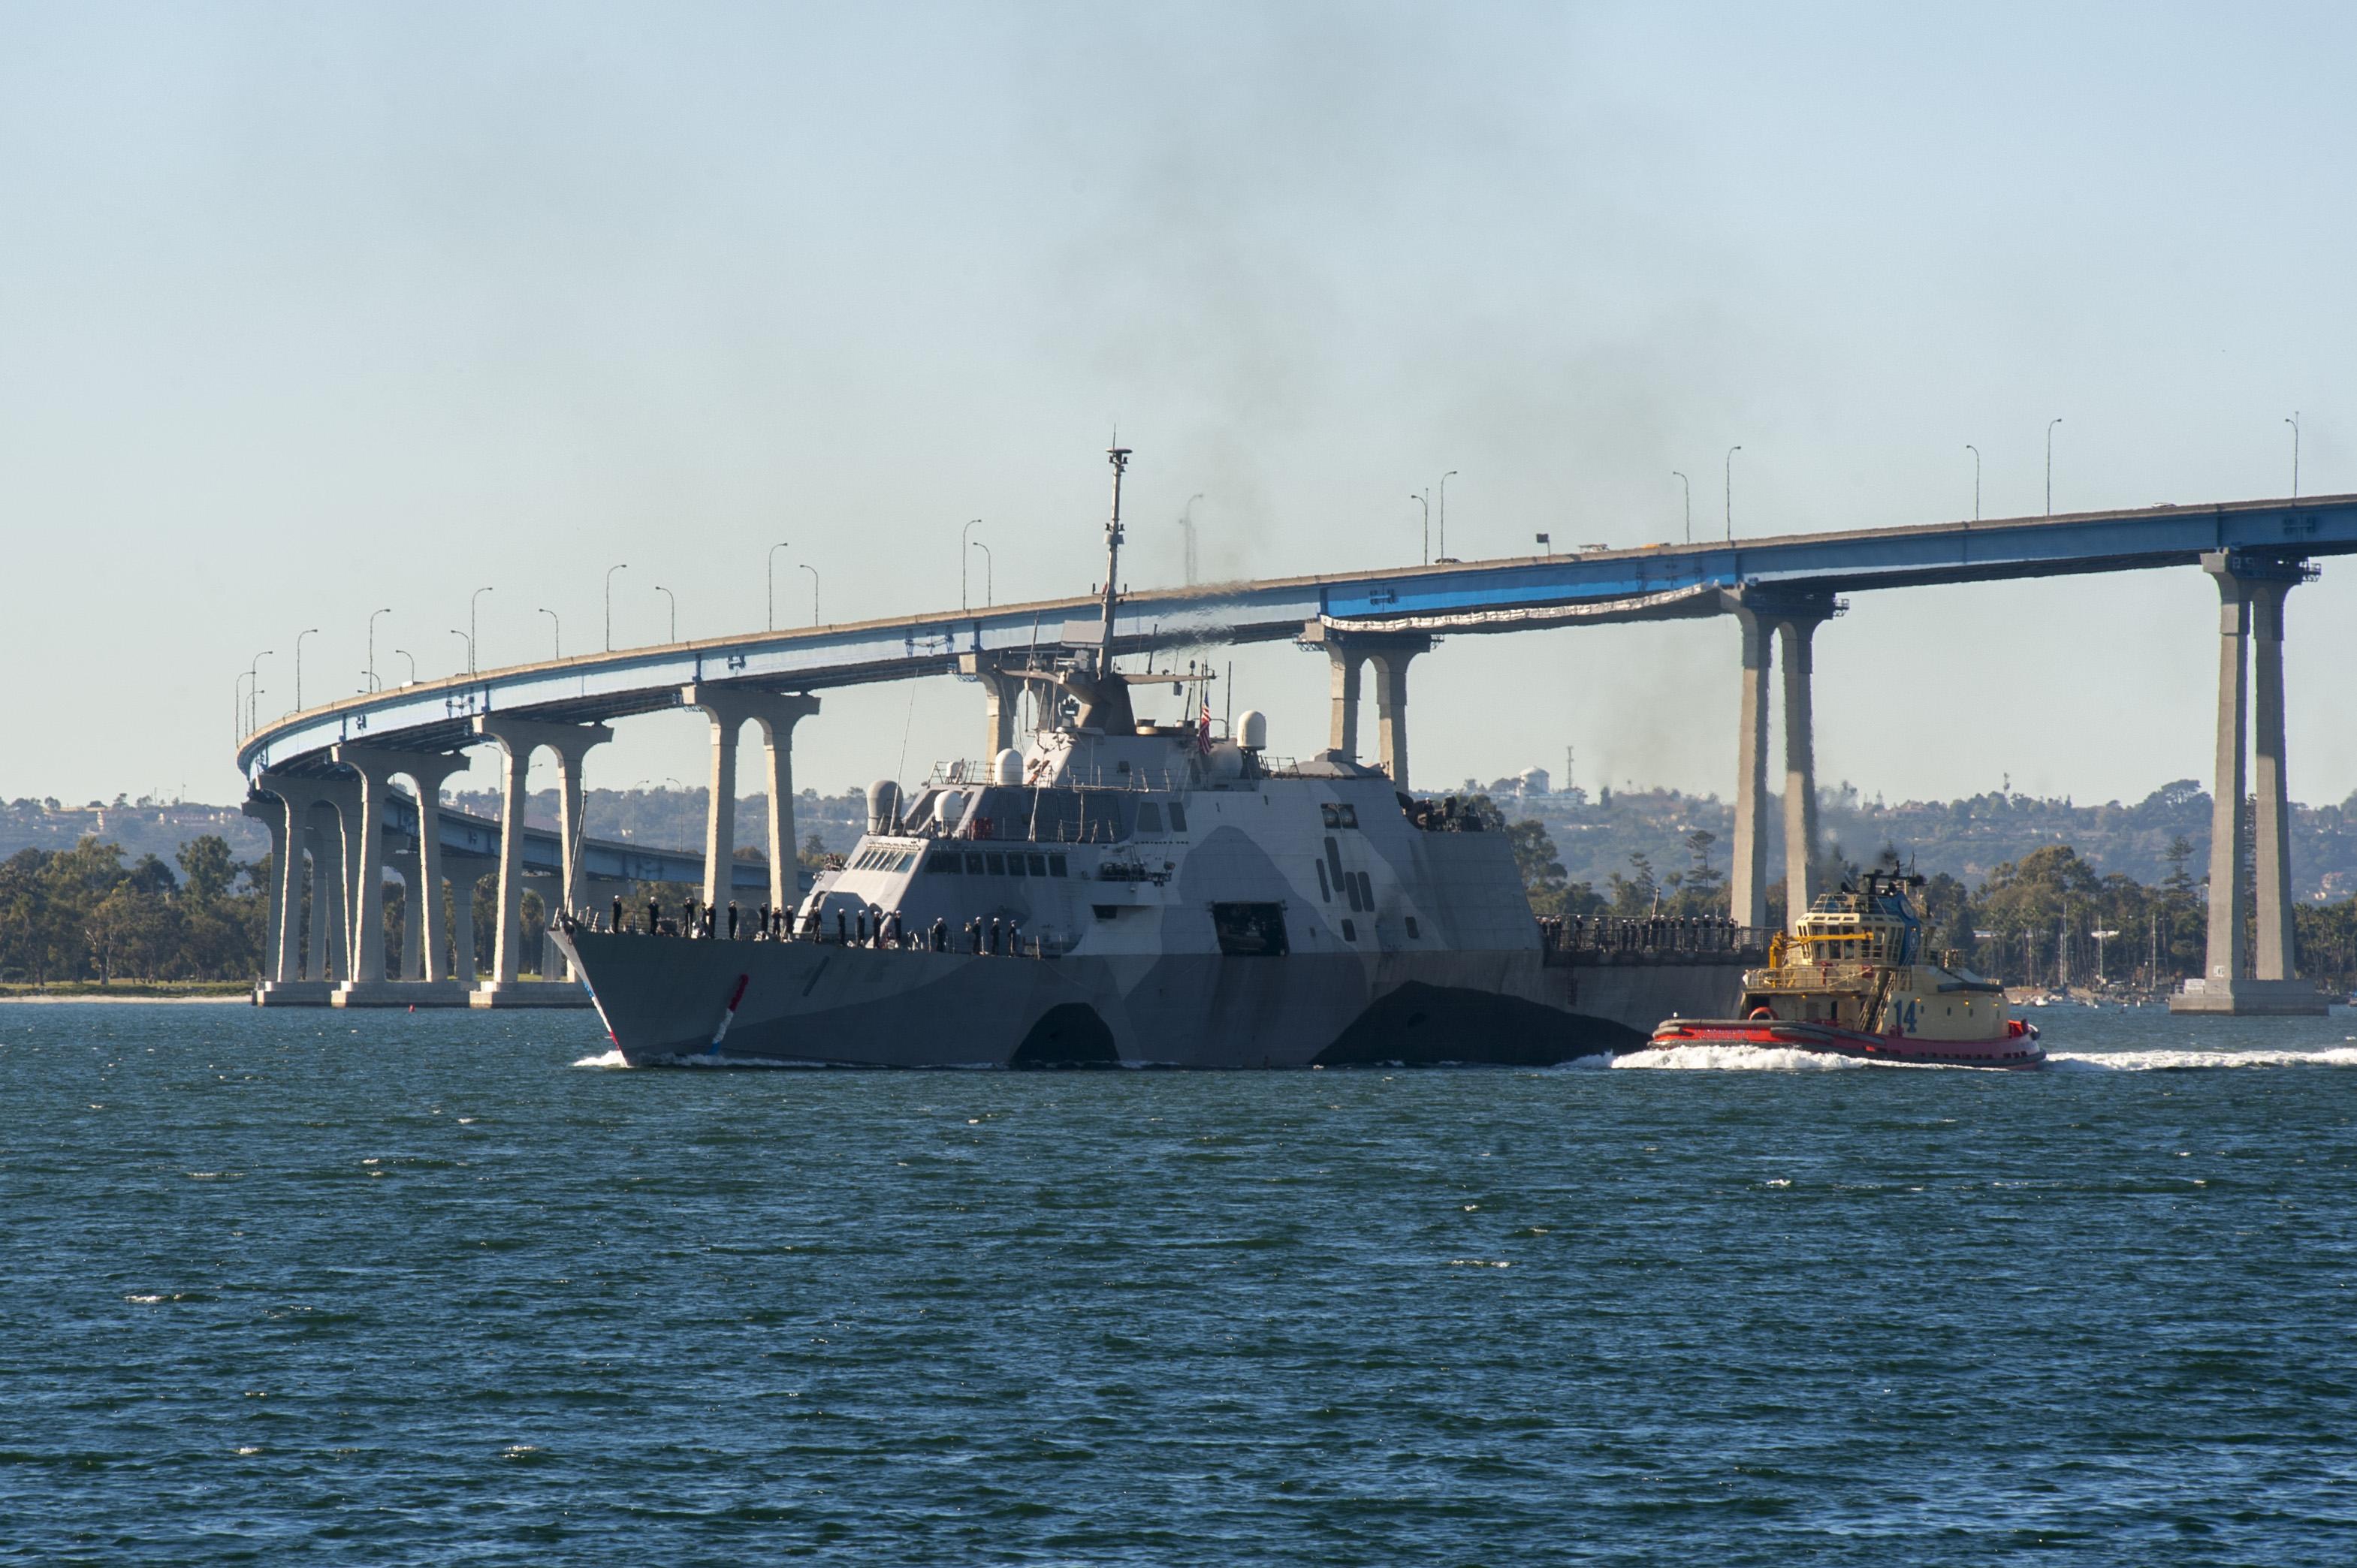 USS FREEDOM LCS-1 Einlaufen San Diego 23.12.2013 Bild: U.S. Navy